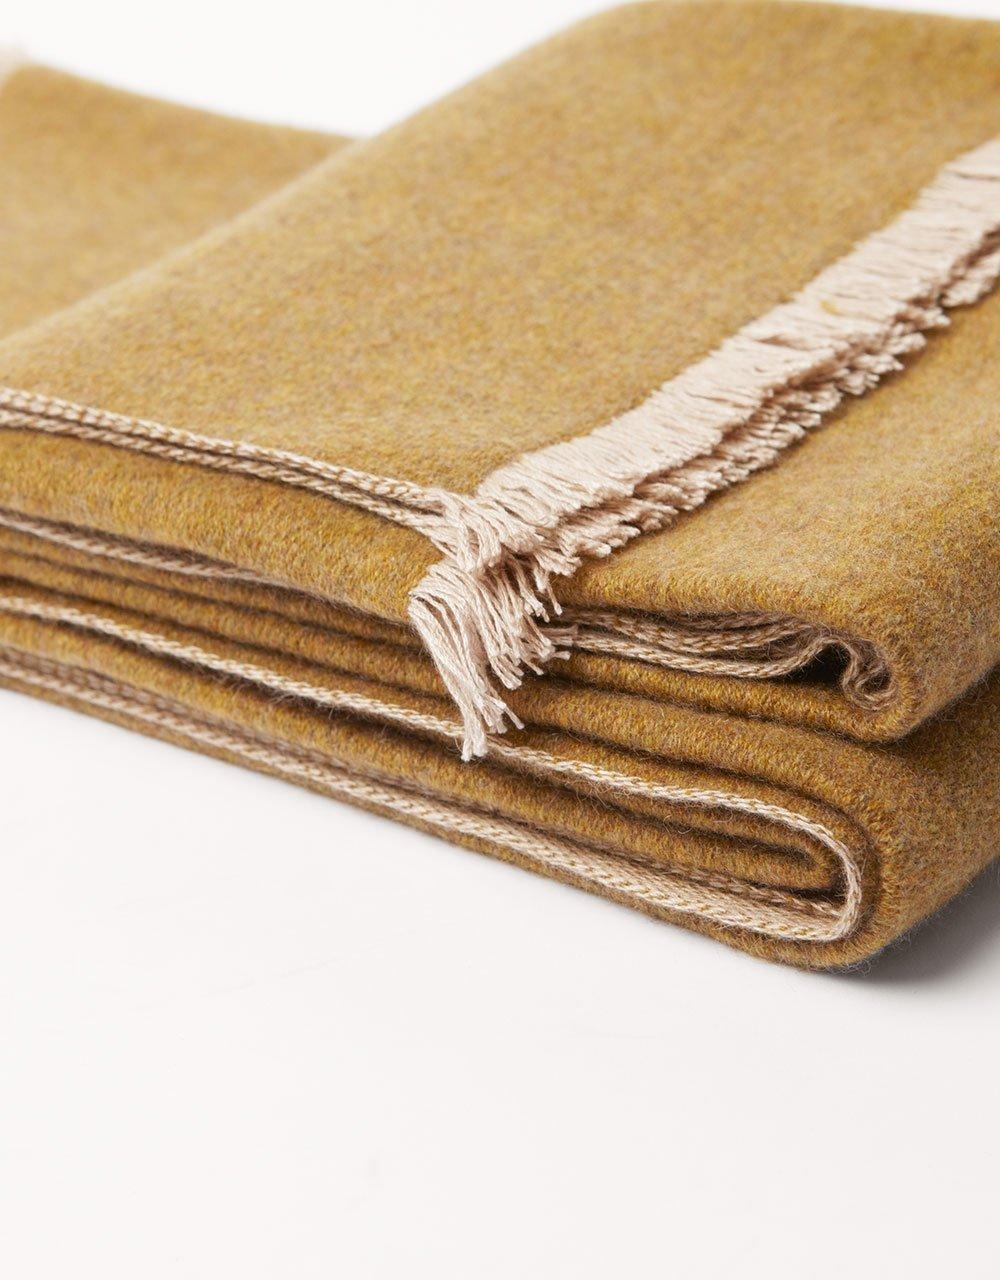 blanket03b